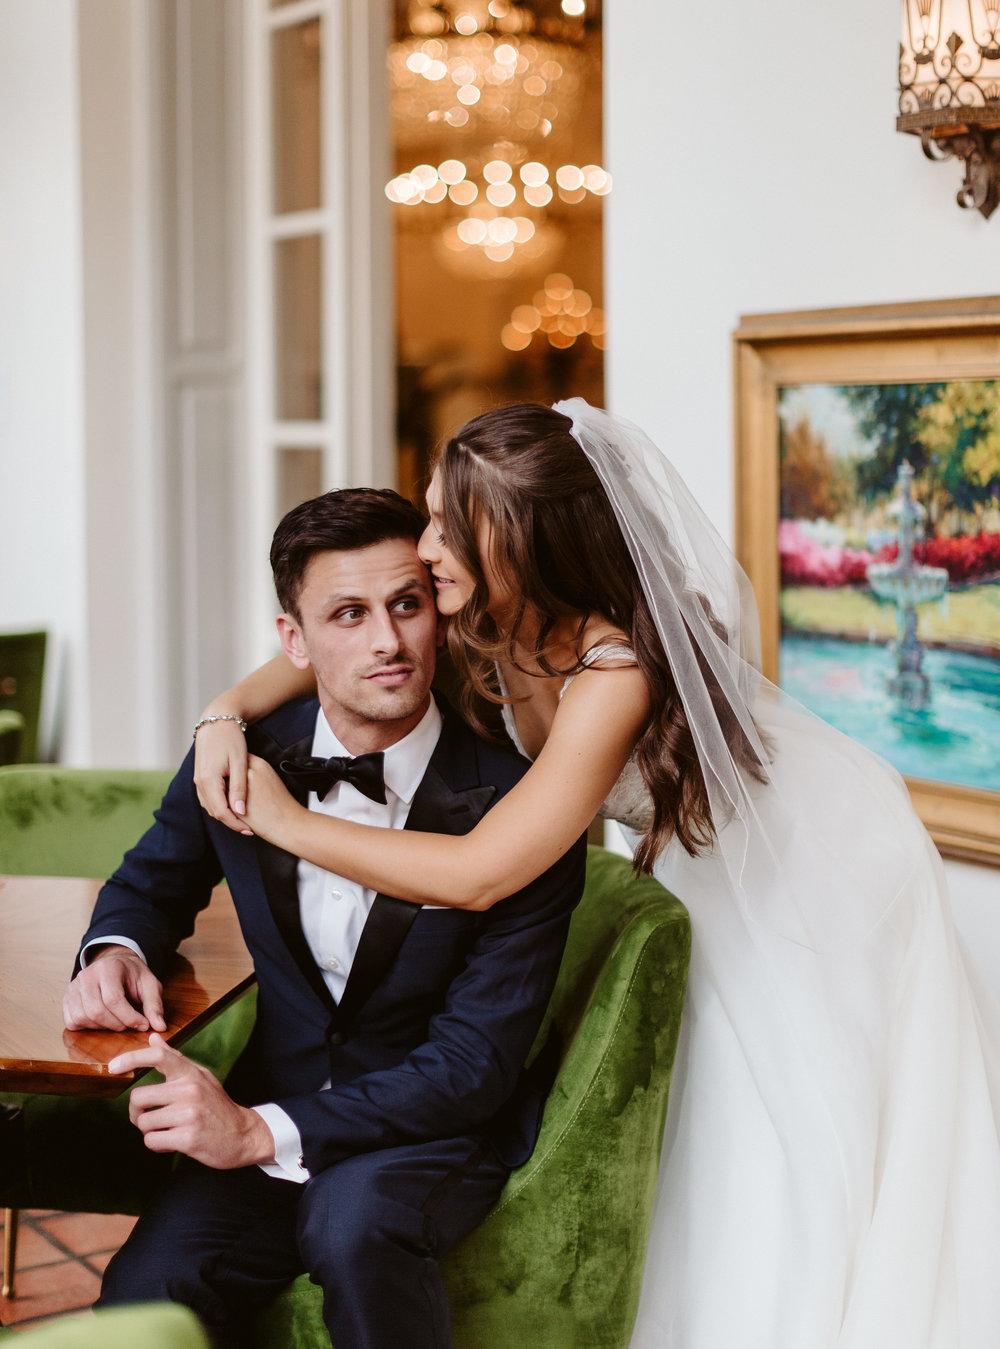 emily-michael-fullwedding-335.jpg